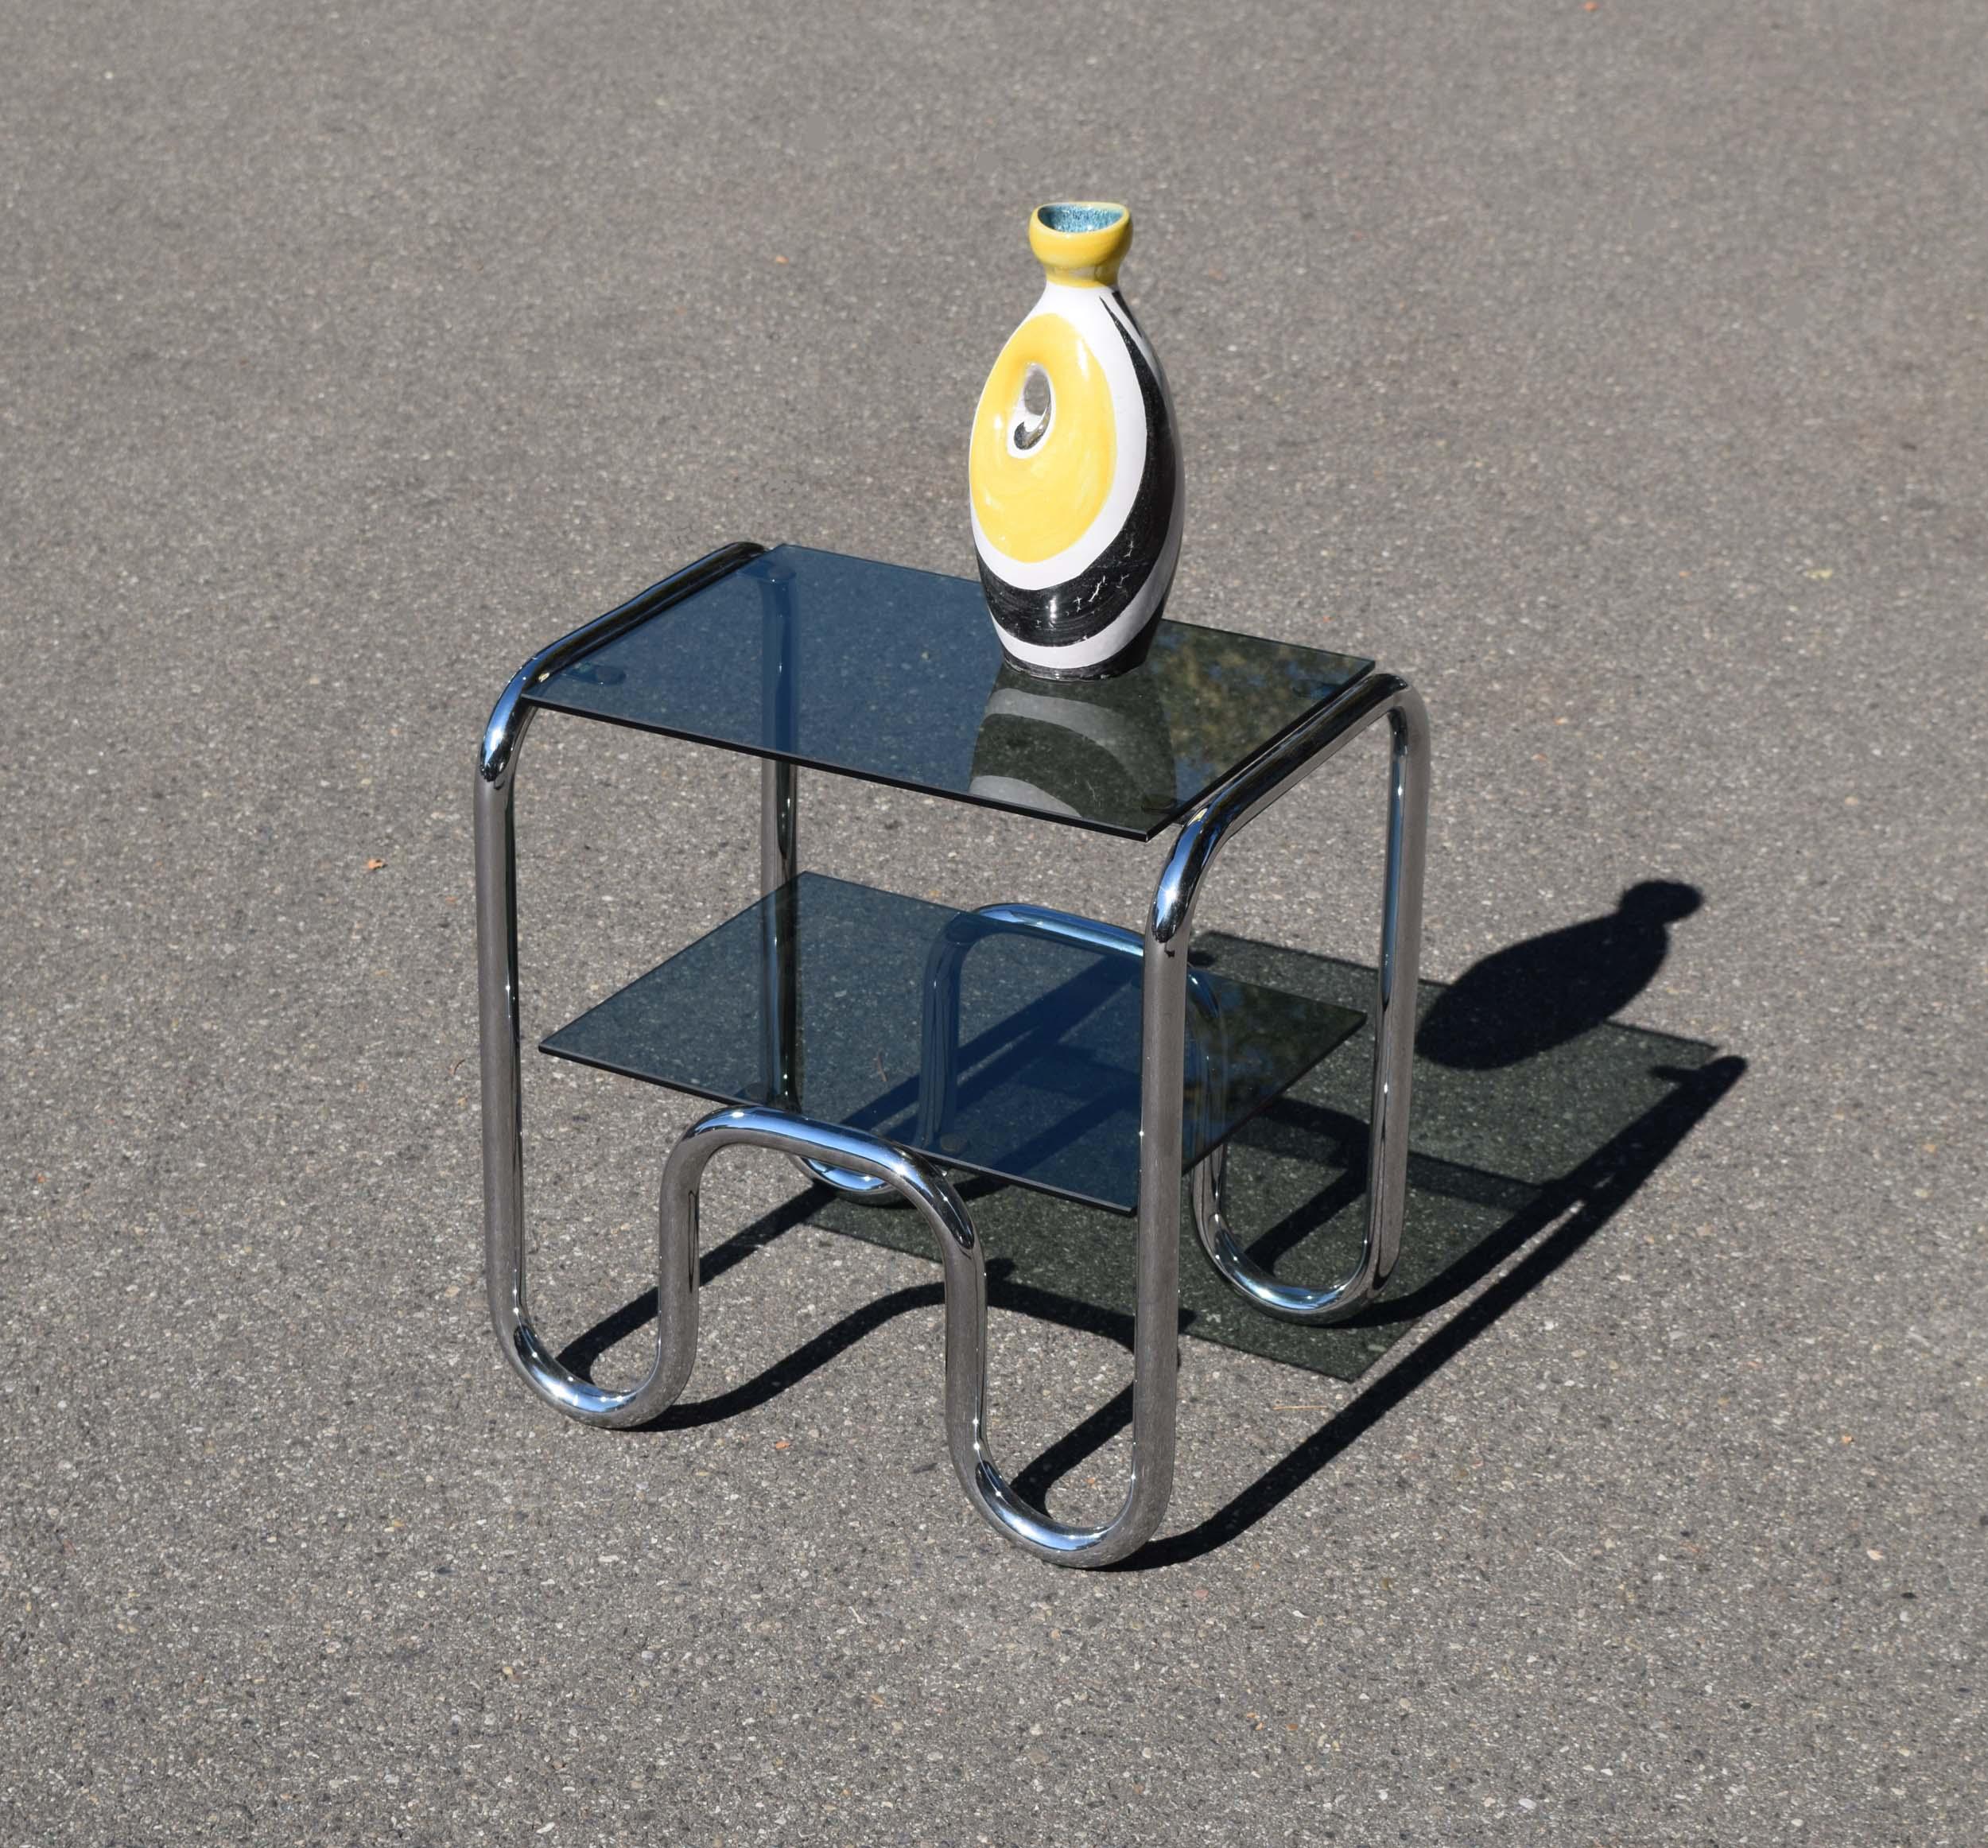 petits meubles et objets design des ann es 1960 70. Black Bedroom Furniture Sets. Home Design Ideas